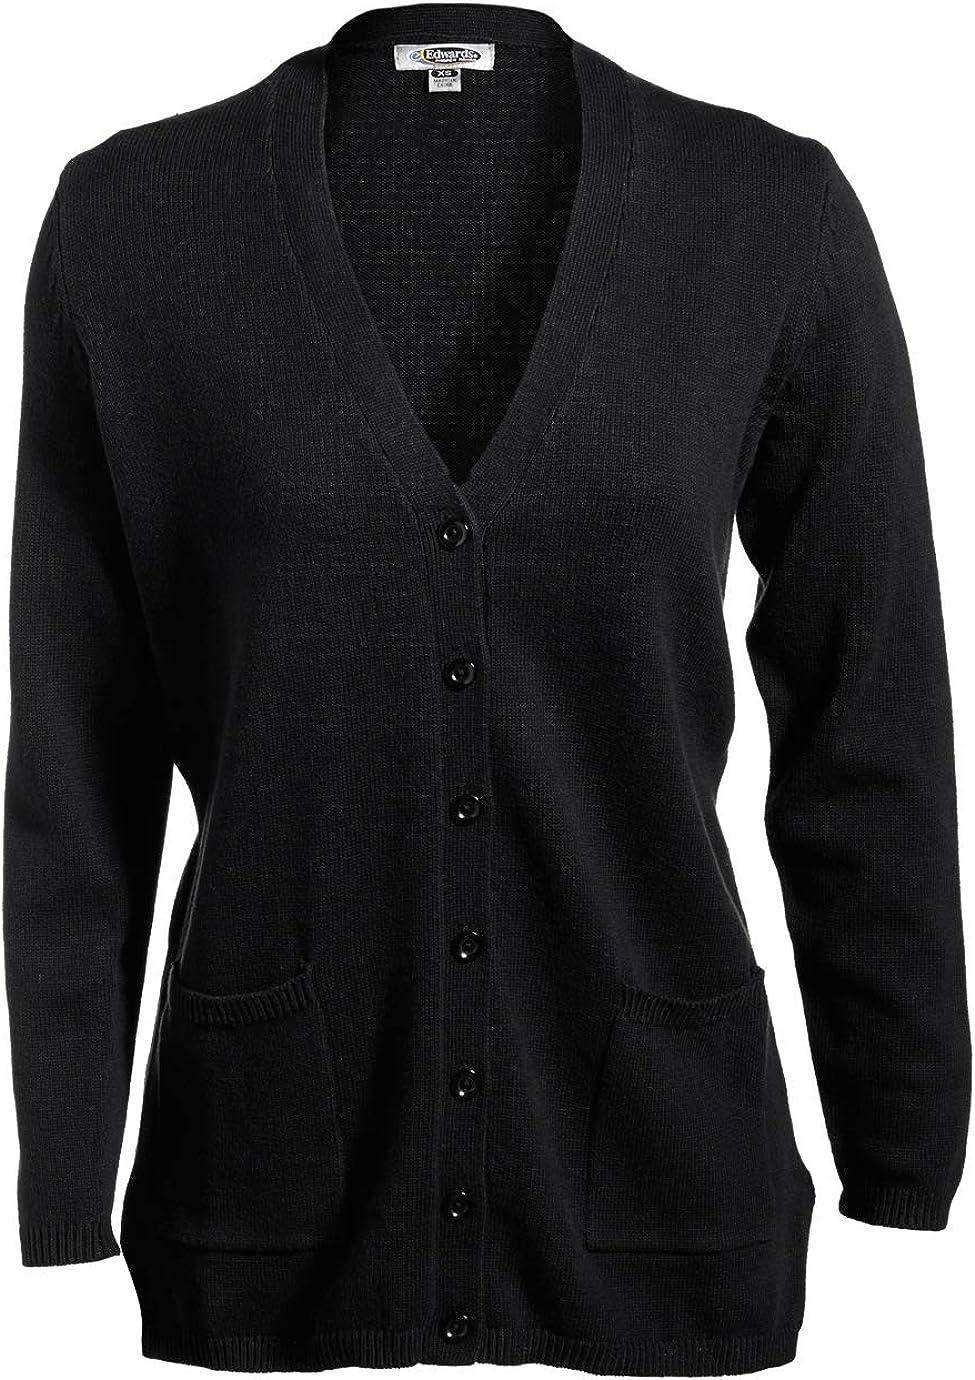 Edwards V-Neck Button Acrylic Cardigan Sweater X-Small White